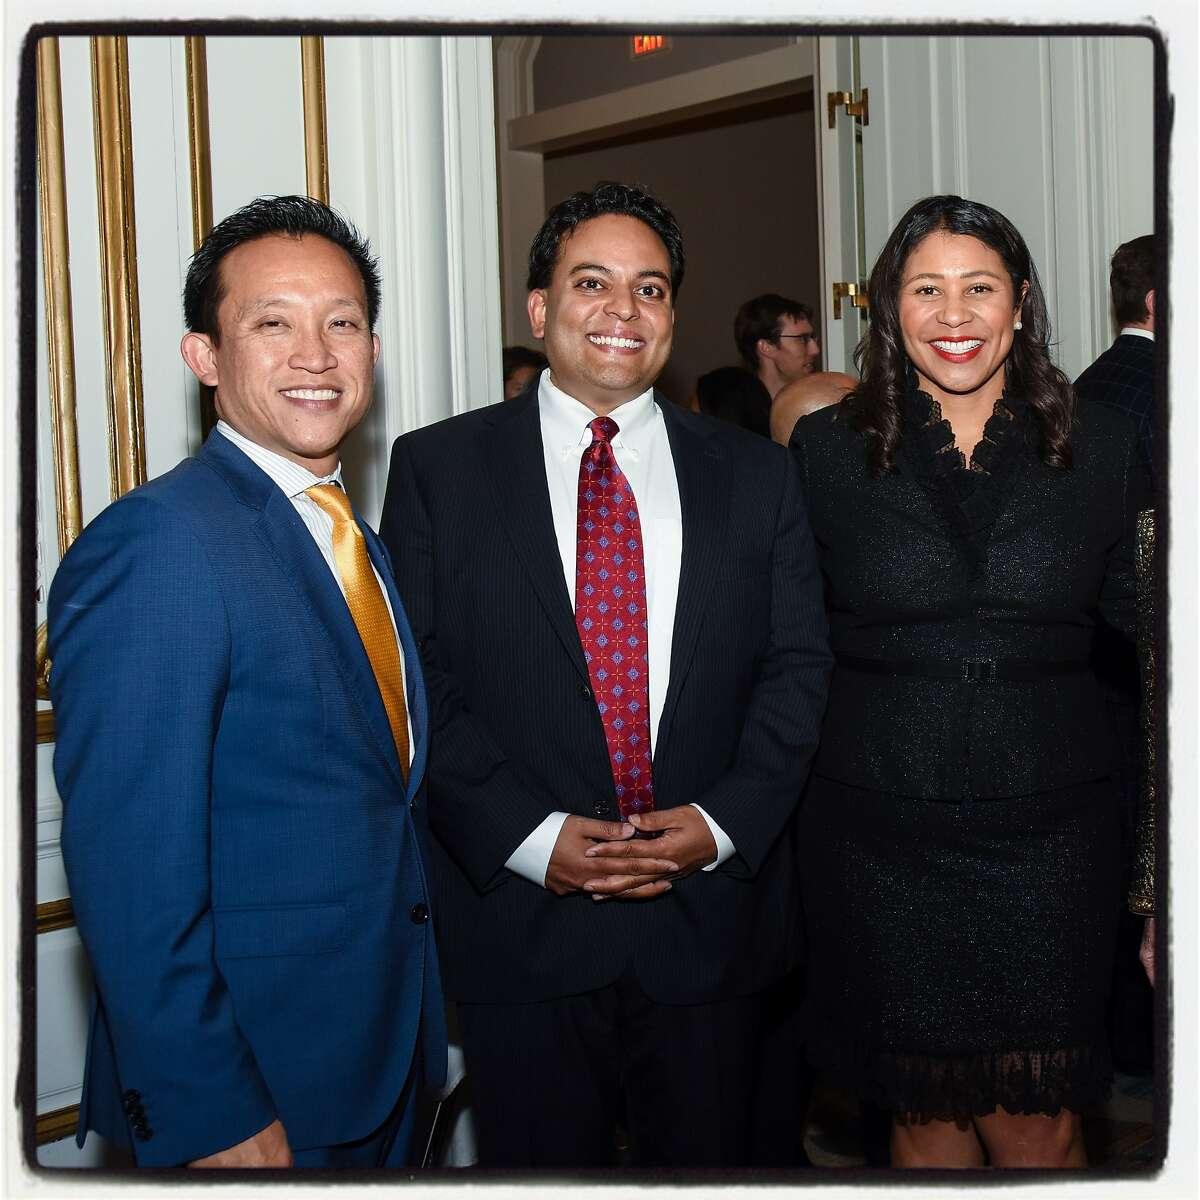 Assemblyman David Chiu (left) with Shanti Director Kaushik Roy and Mayor London Breed. Oct. 3, 2019.